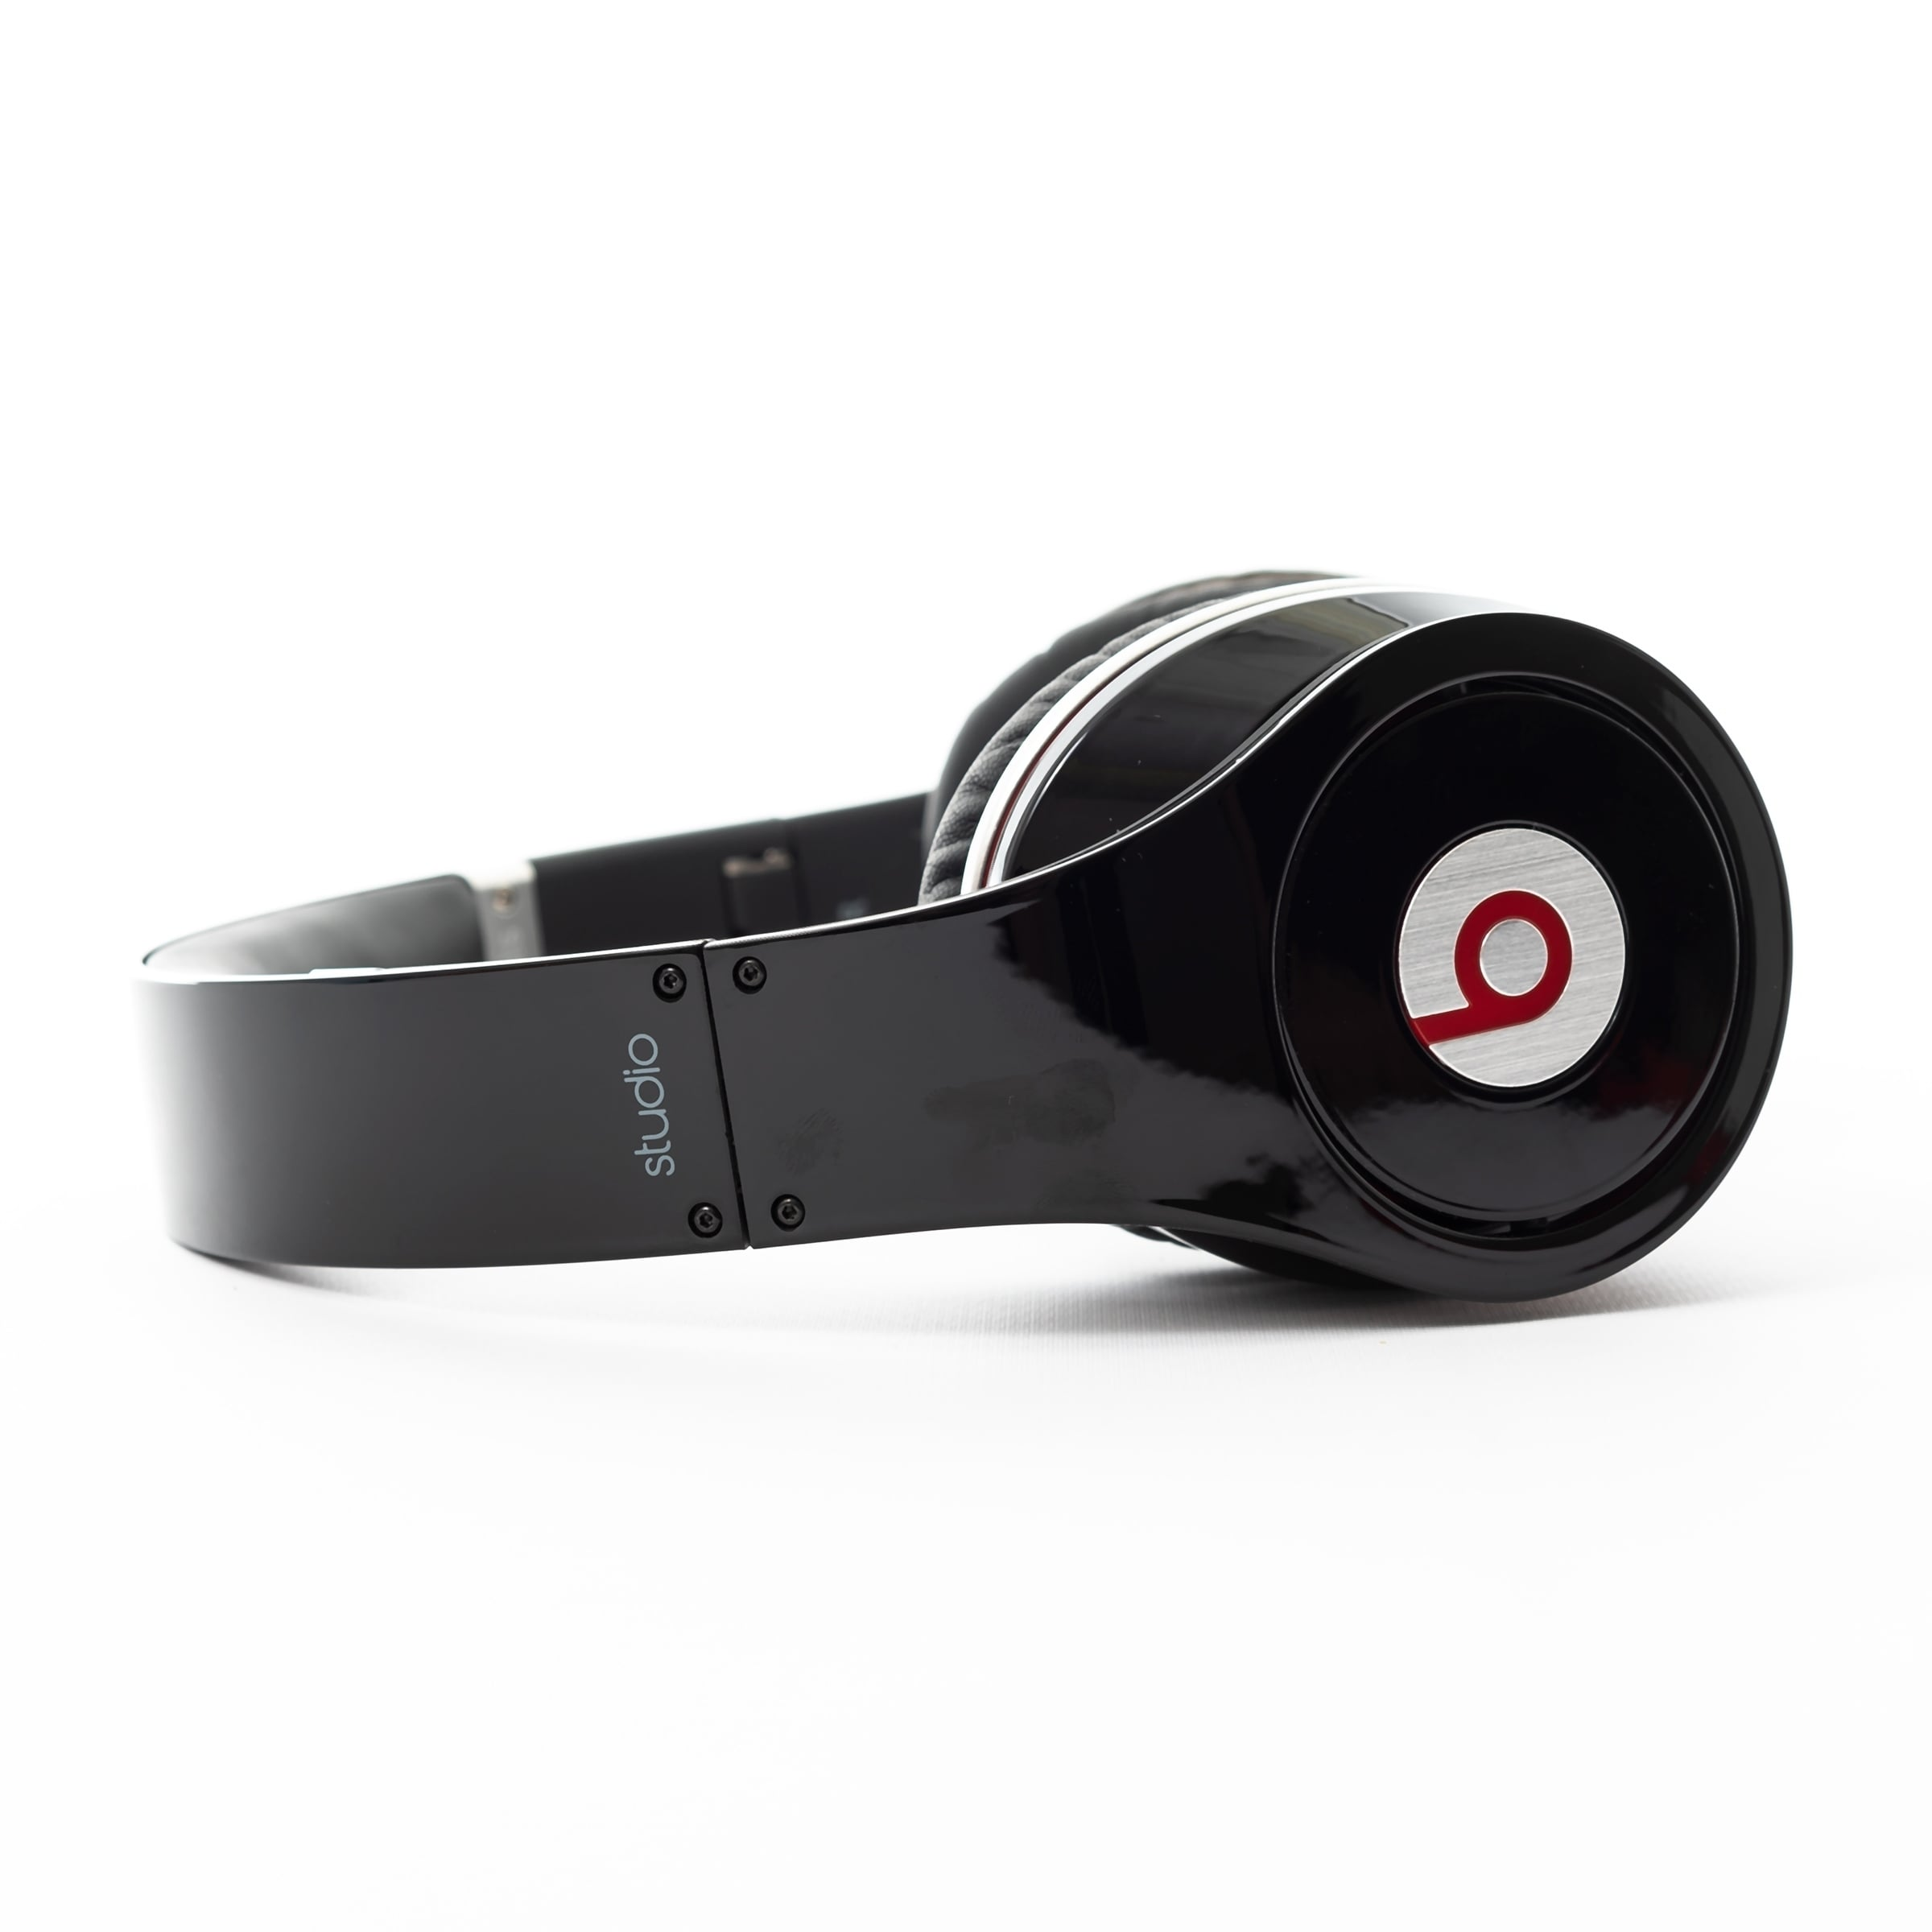 Beats by Dre Studio - Refurbished by Overstock ORANGE